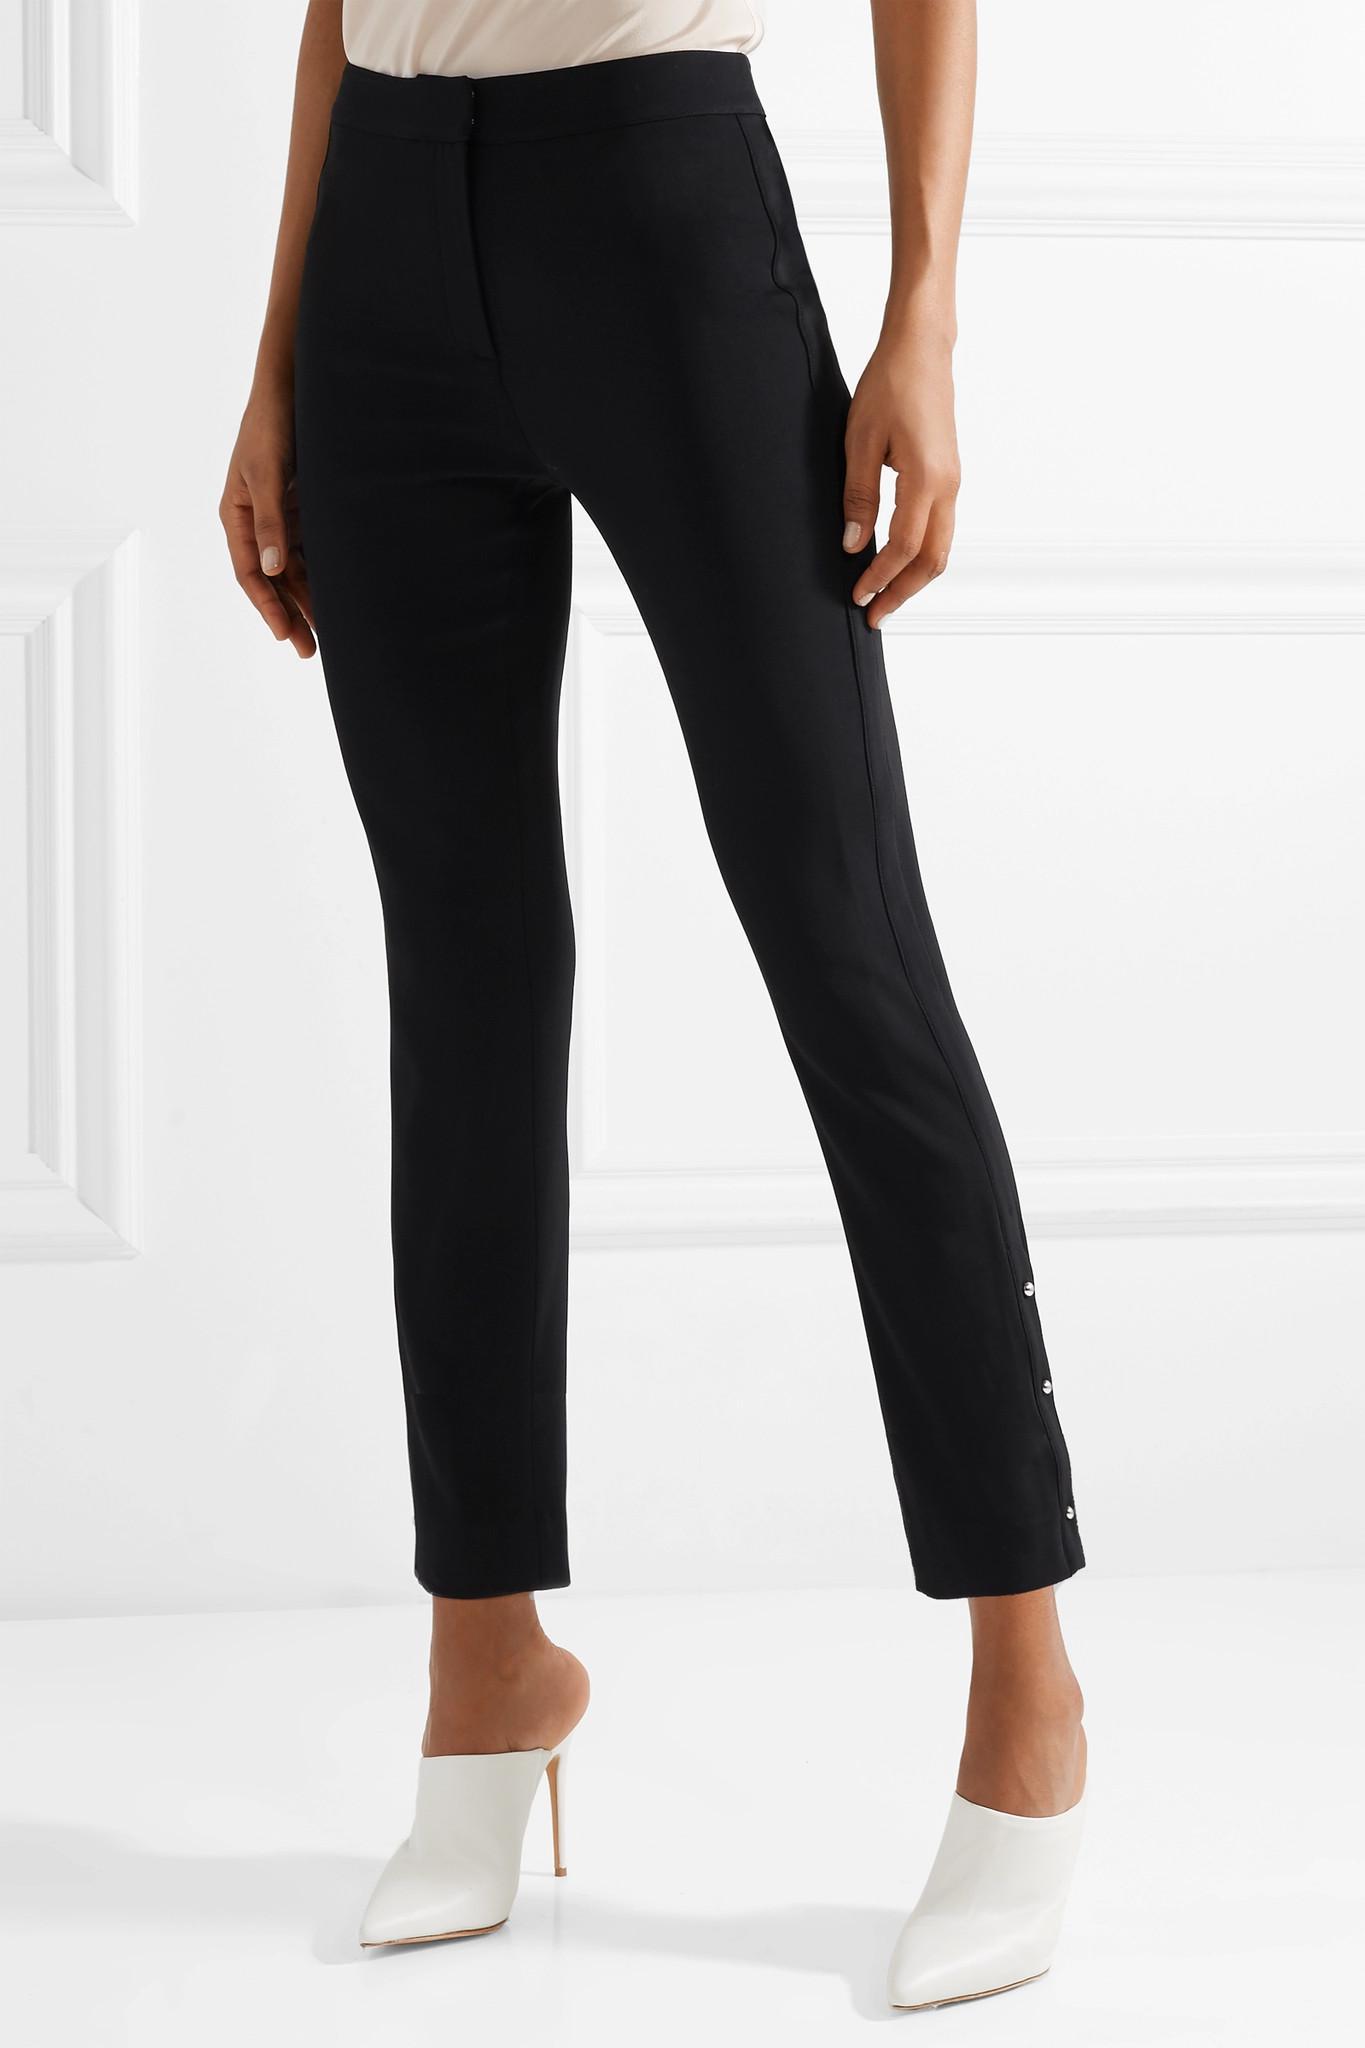 Embellished Stretch-woven Straight-leg Pants - Black Jason Wu RafeVjMGJV